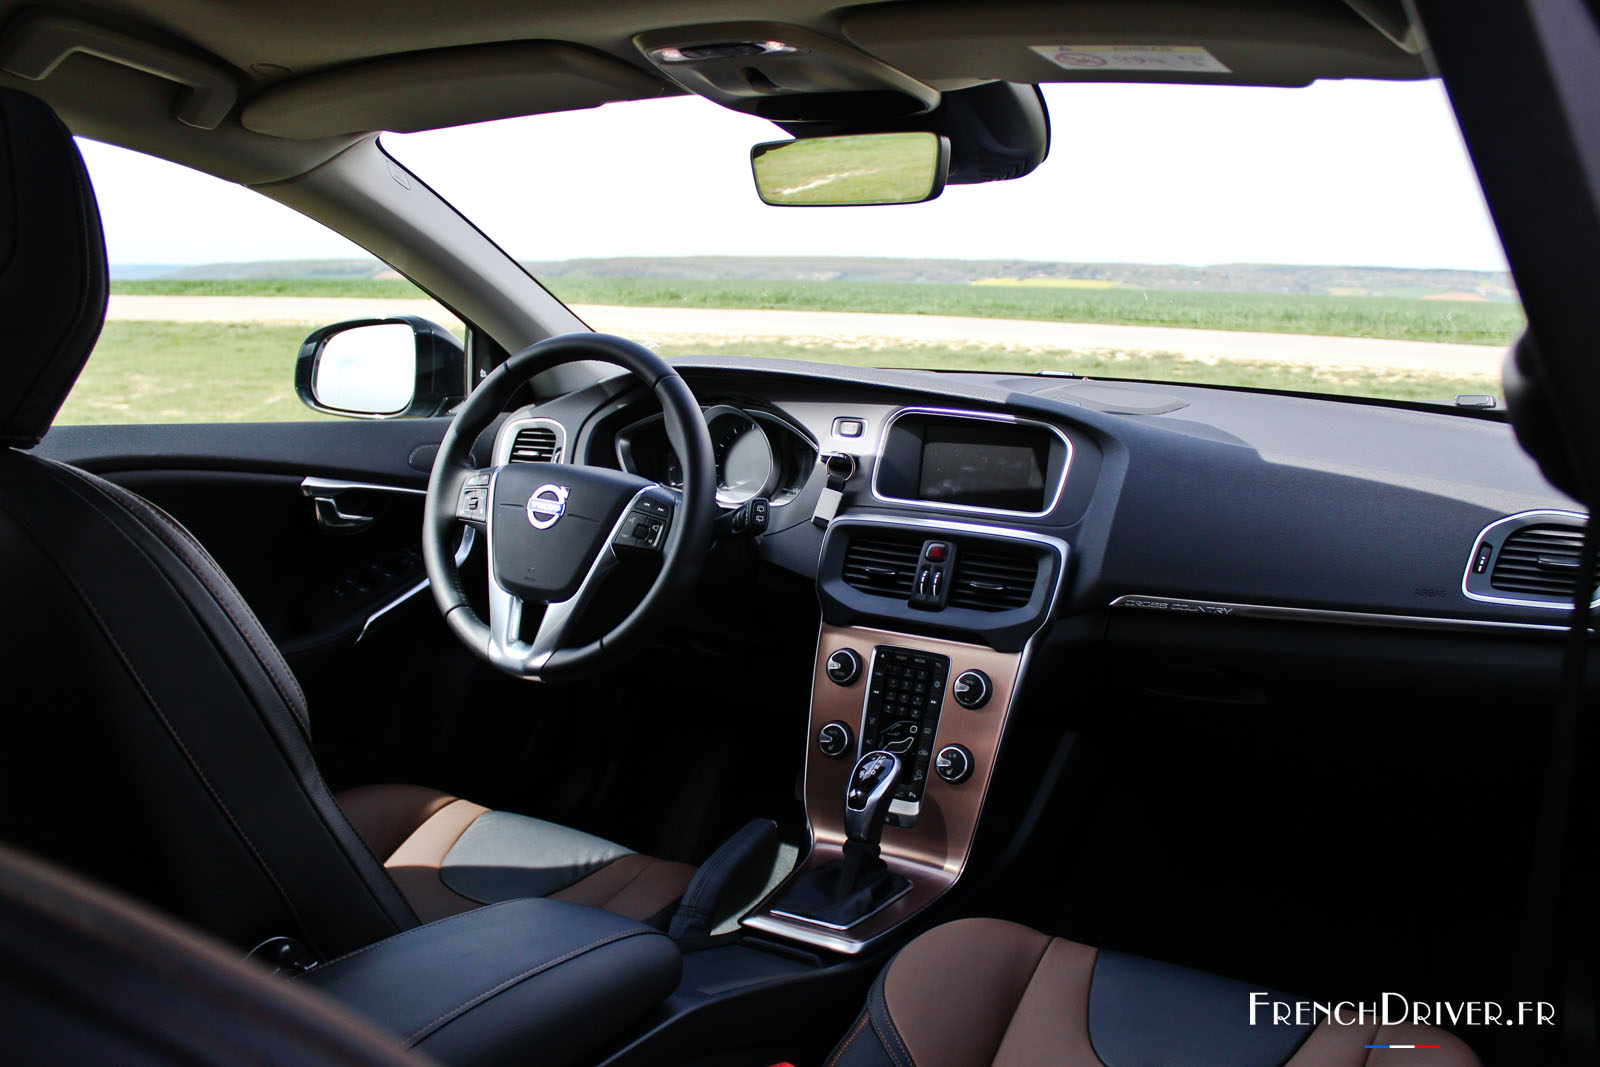 Super Essai de la Volvo V40 Cross Country T5 AWD - French Driver EE-64